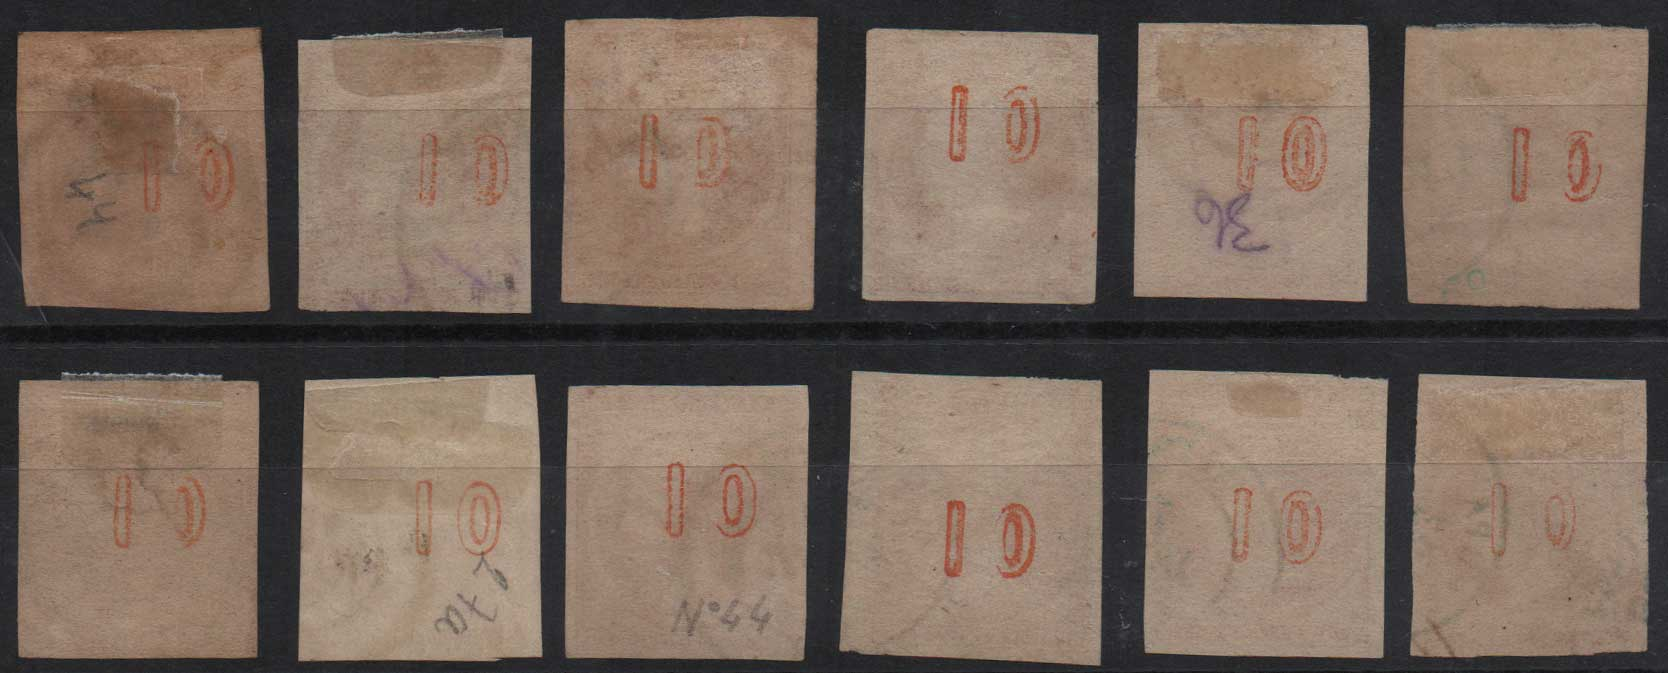 Lot 25 - -  LARGE HERMES HEAD large hermes head -  Athens Auctions Public Auction 81General Stamp Sale